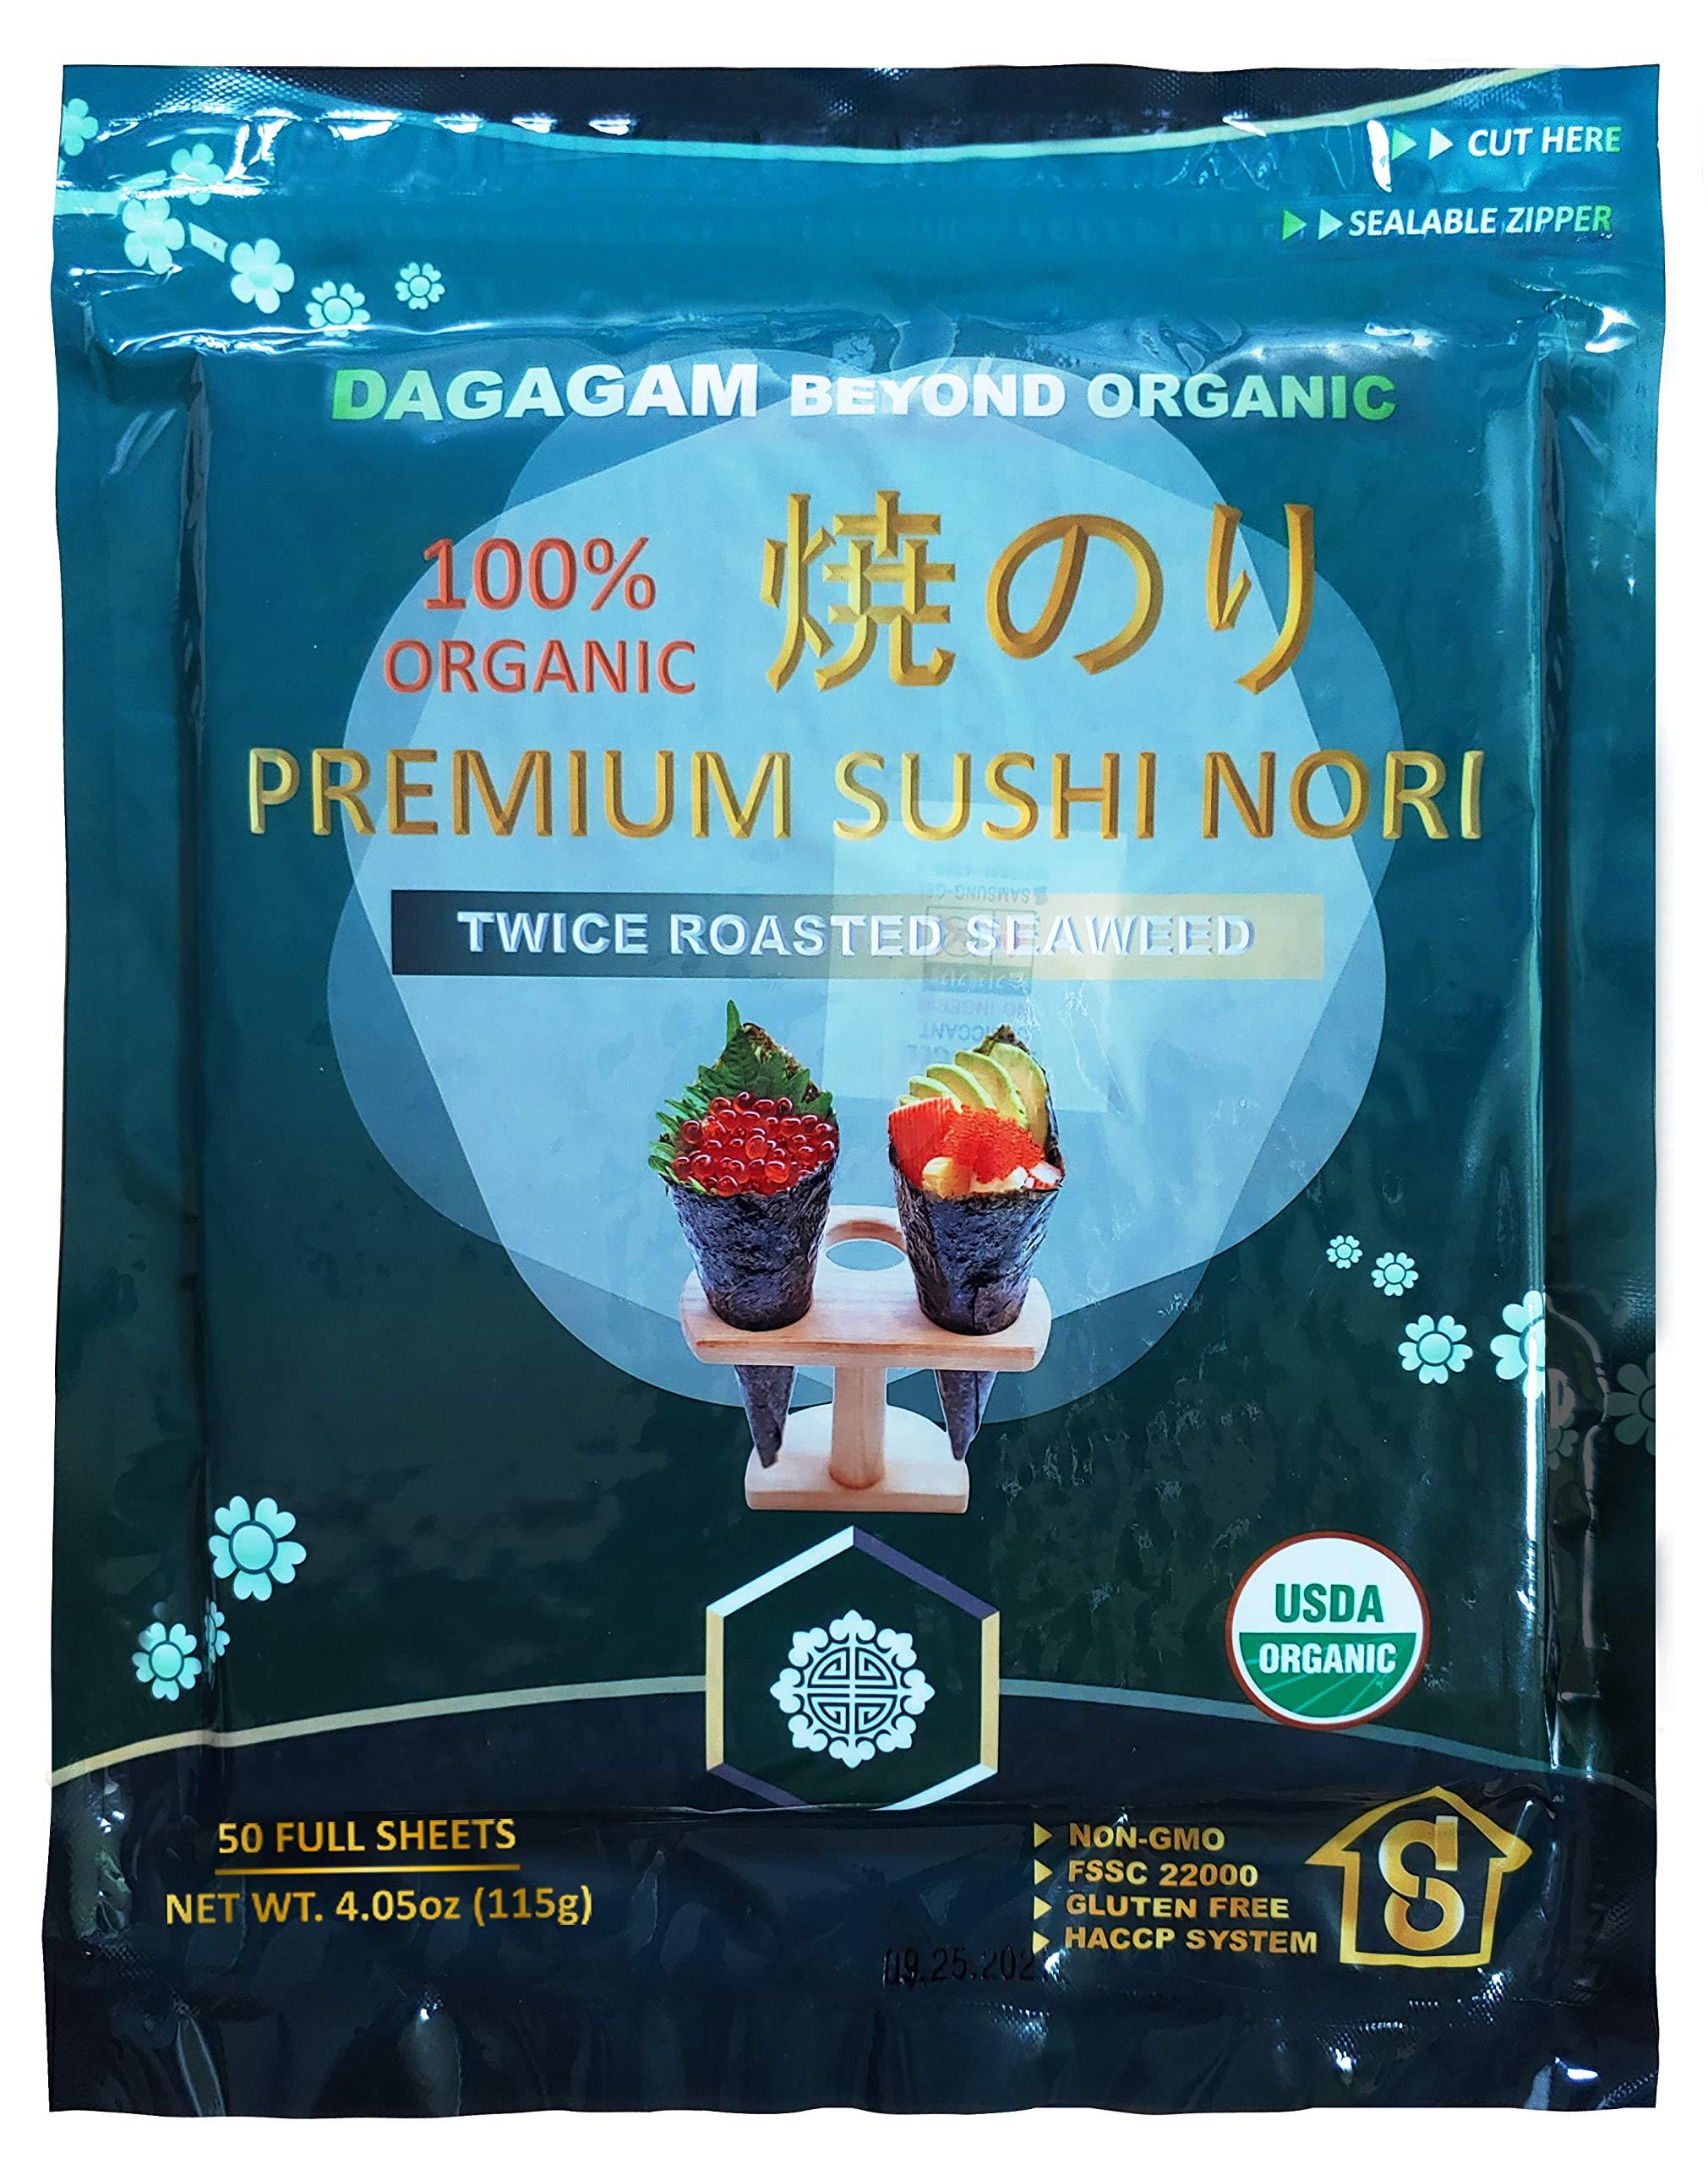 Organic Sushi Nori, Twice Roasted Seaweed, Premium Grade (50 Full Sheets) : USDA, Vegan, Non-GMO, Gluten-free, Dietary Fiber |DAGAGAM